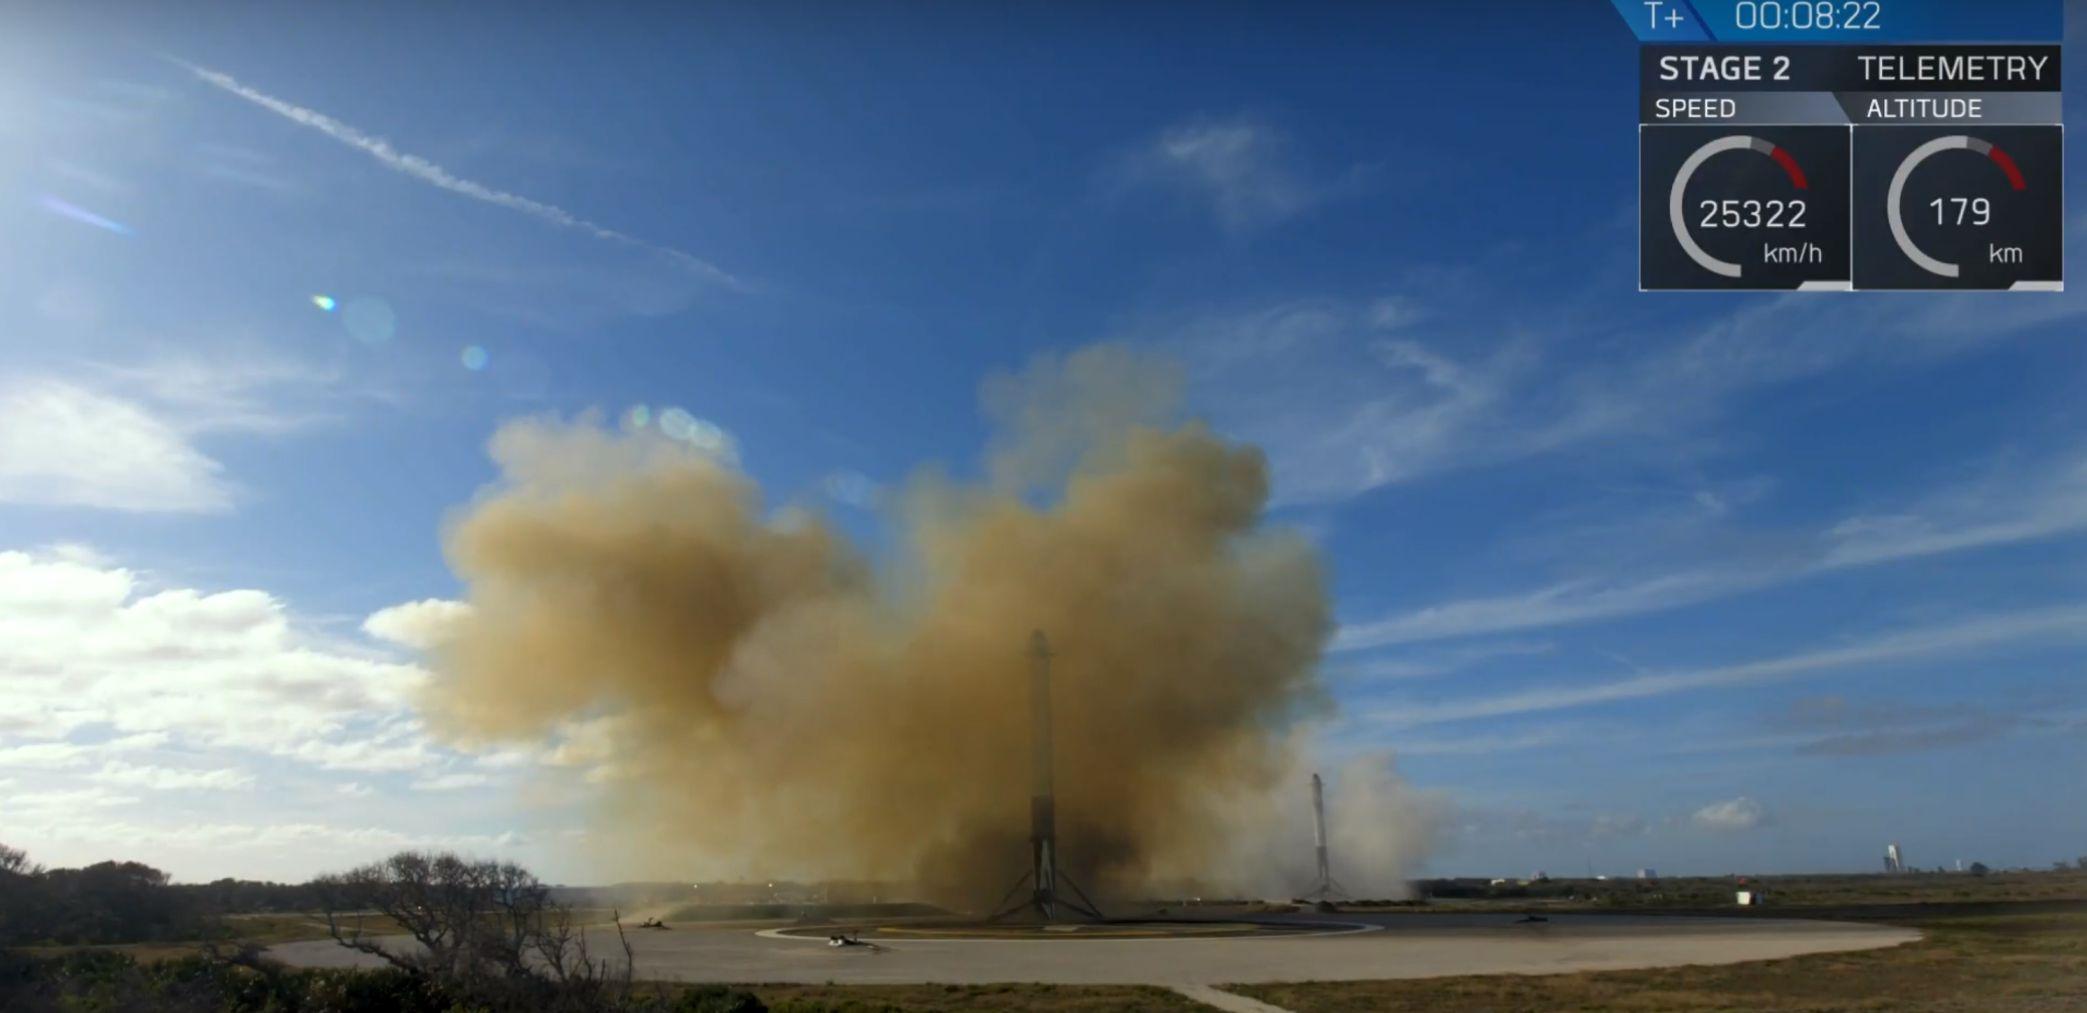 Booster landings 2